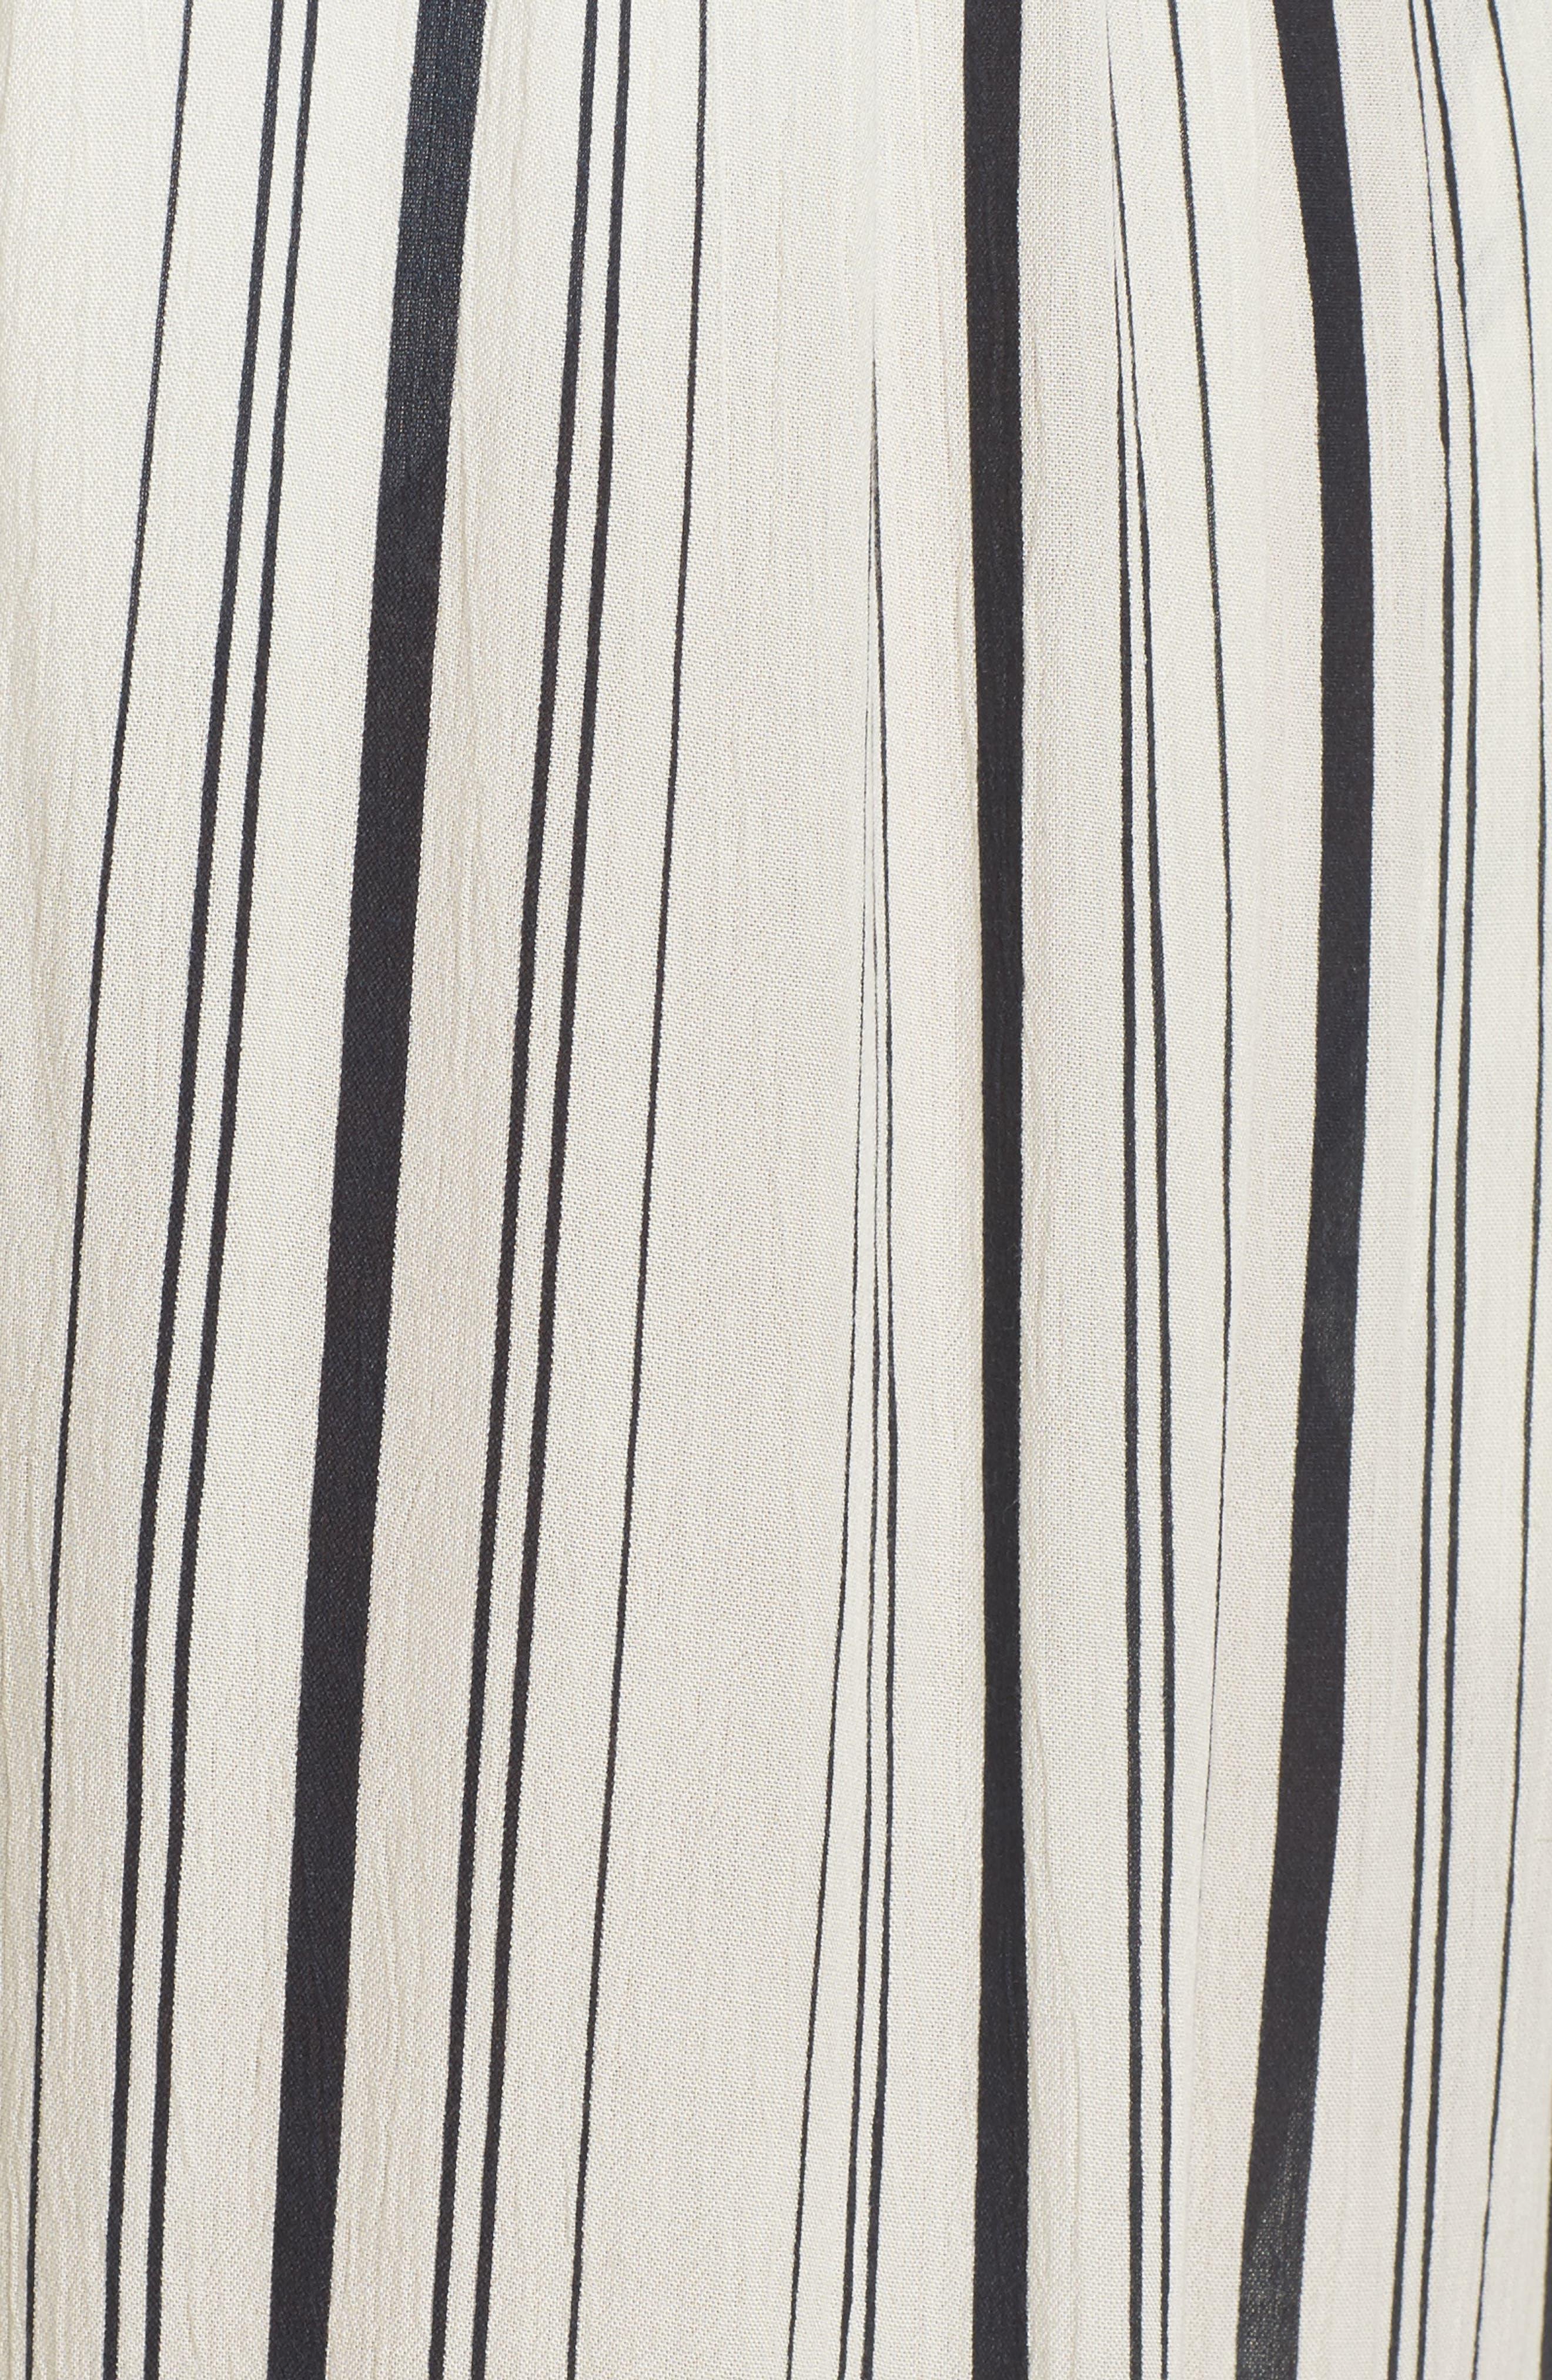 Faustine Cover-Up Jumpsuit,                             Alternate thumbnail 5, color,                             White/ Black